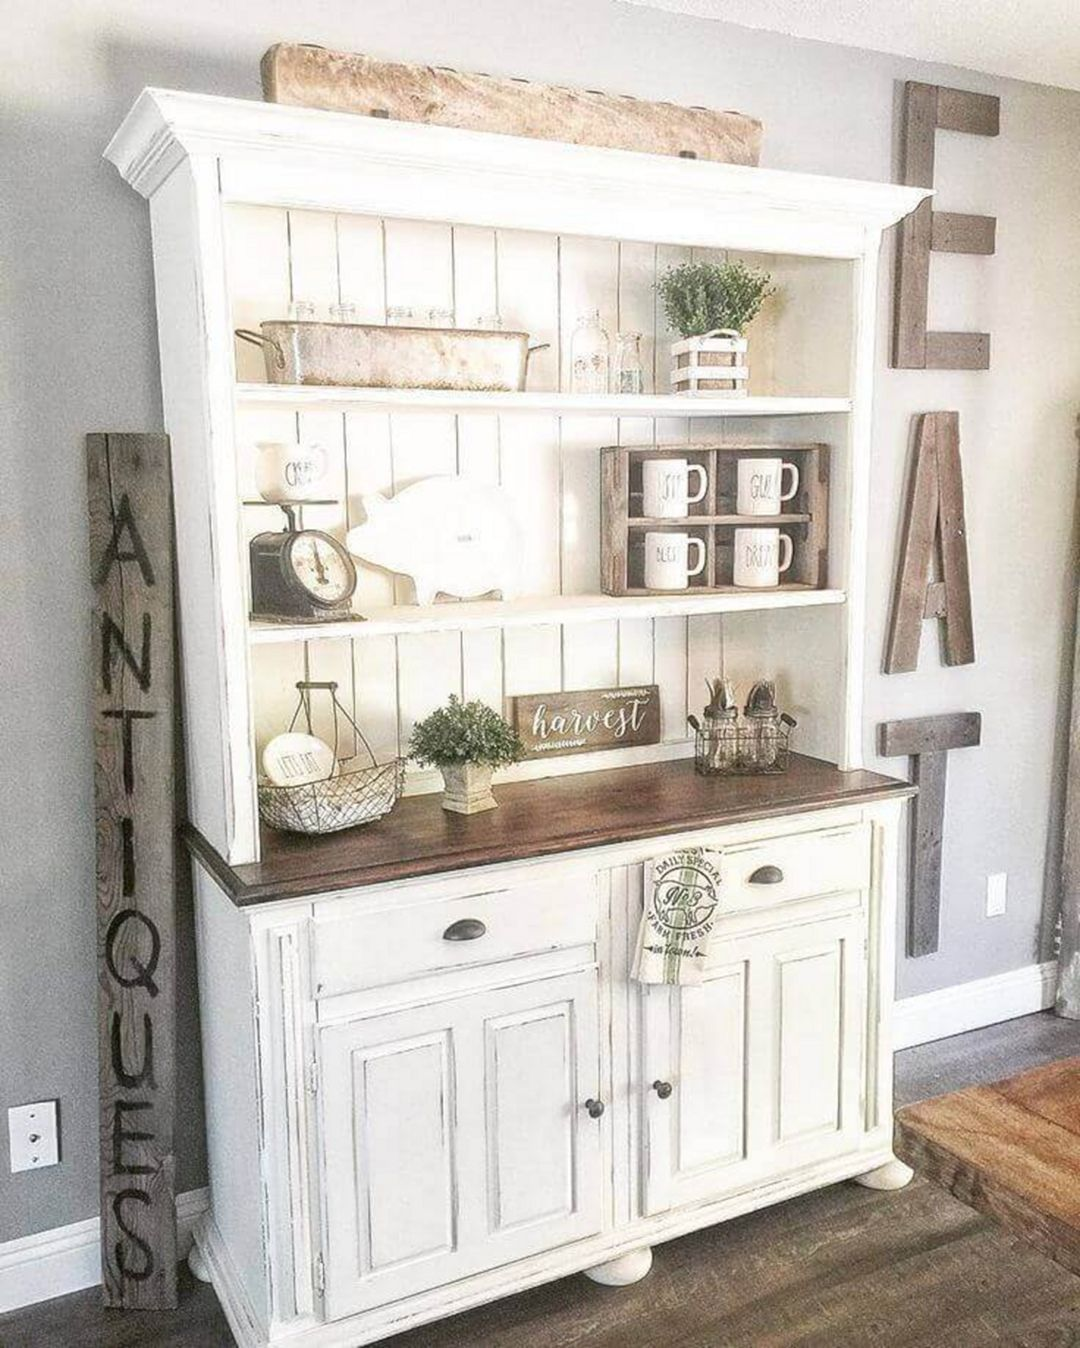 Marvelous Rustic Country Farmhouse Decor Ideas Kitchen Design